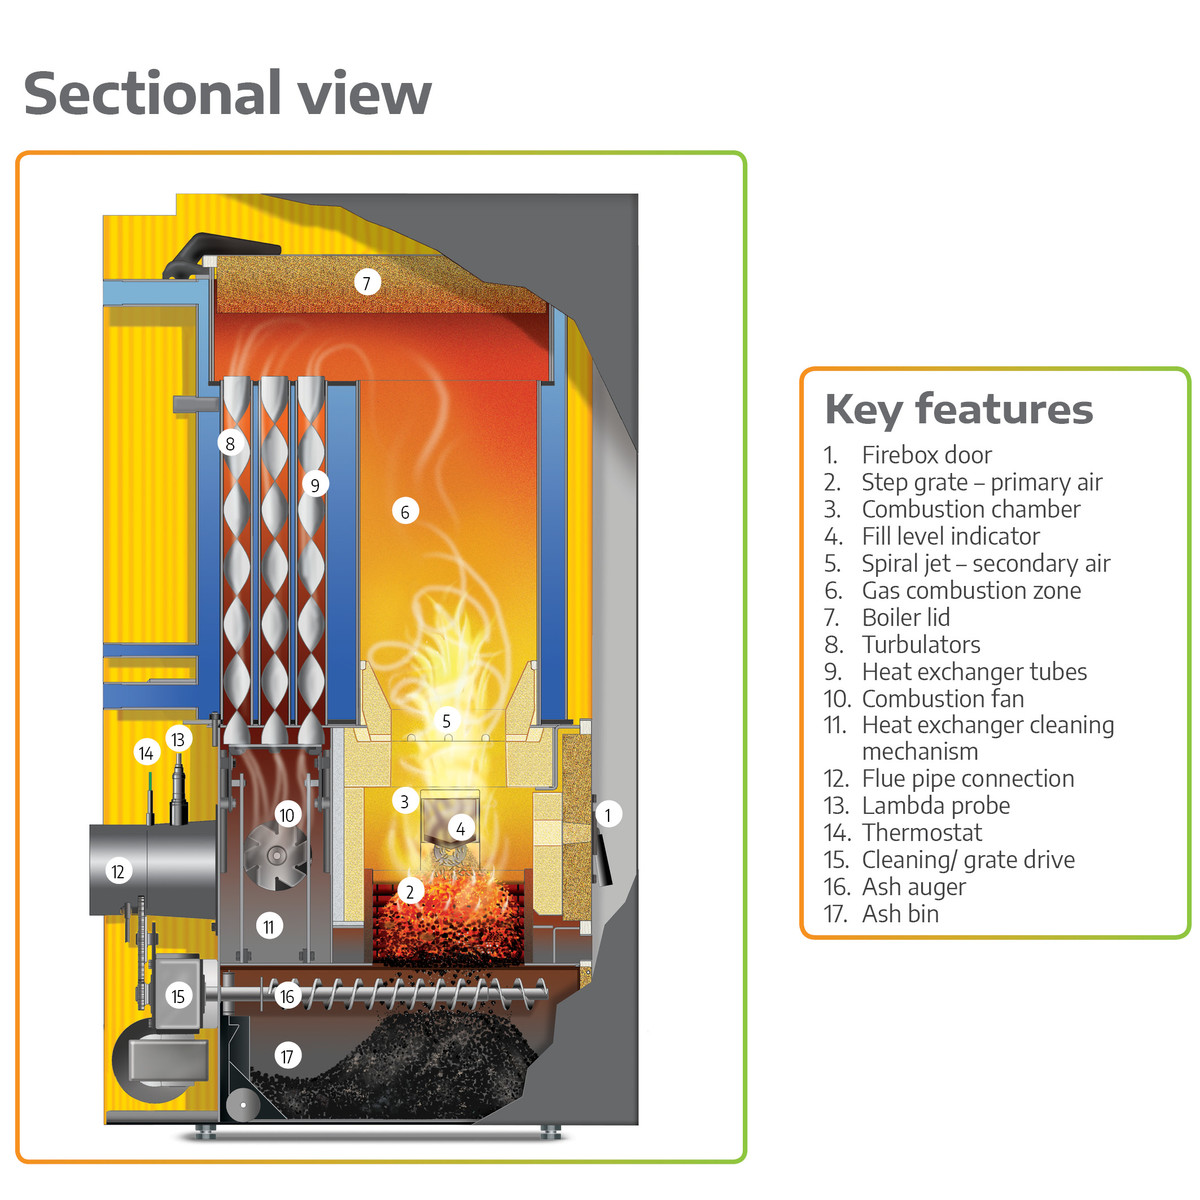 Guntamatic Biocom biomass boiler information